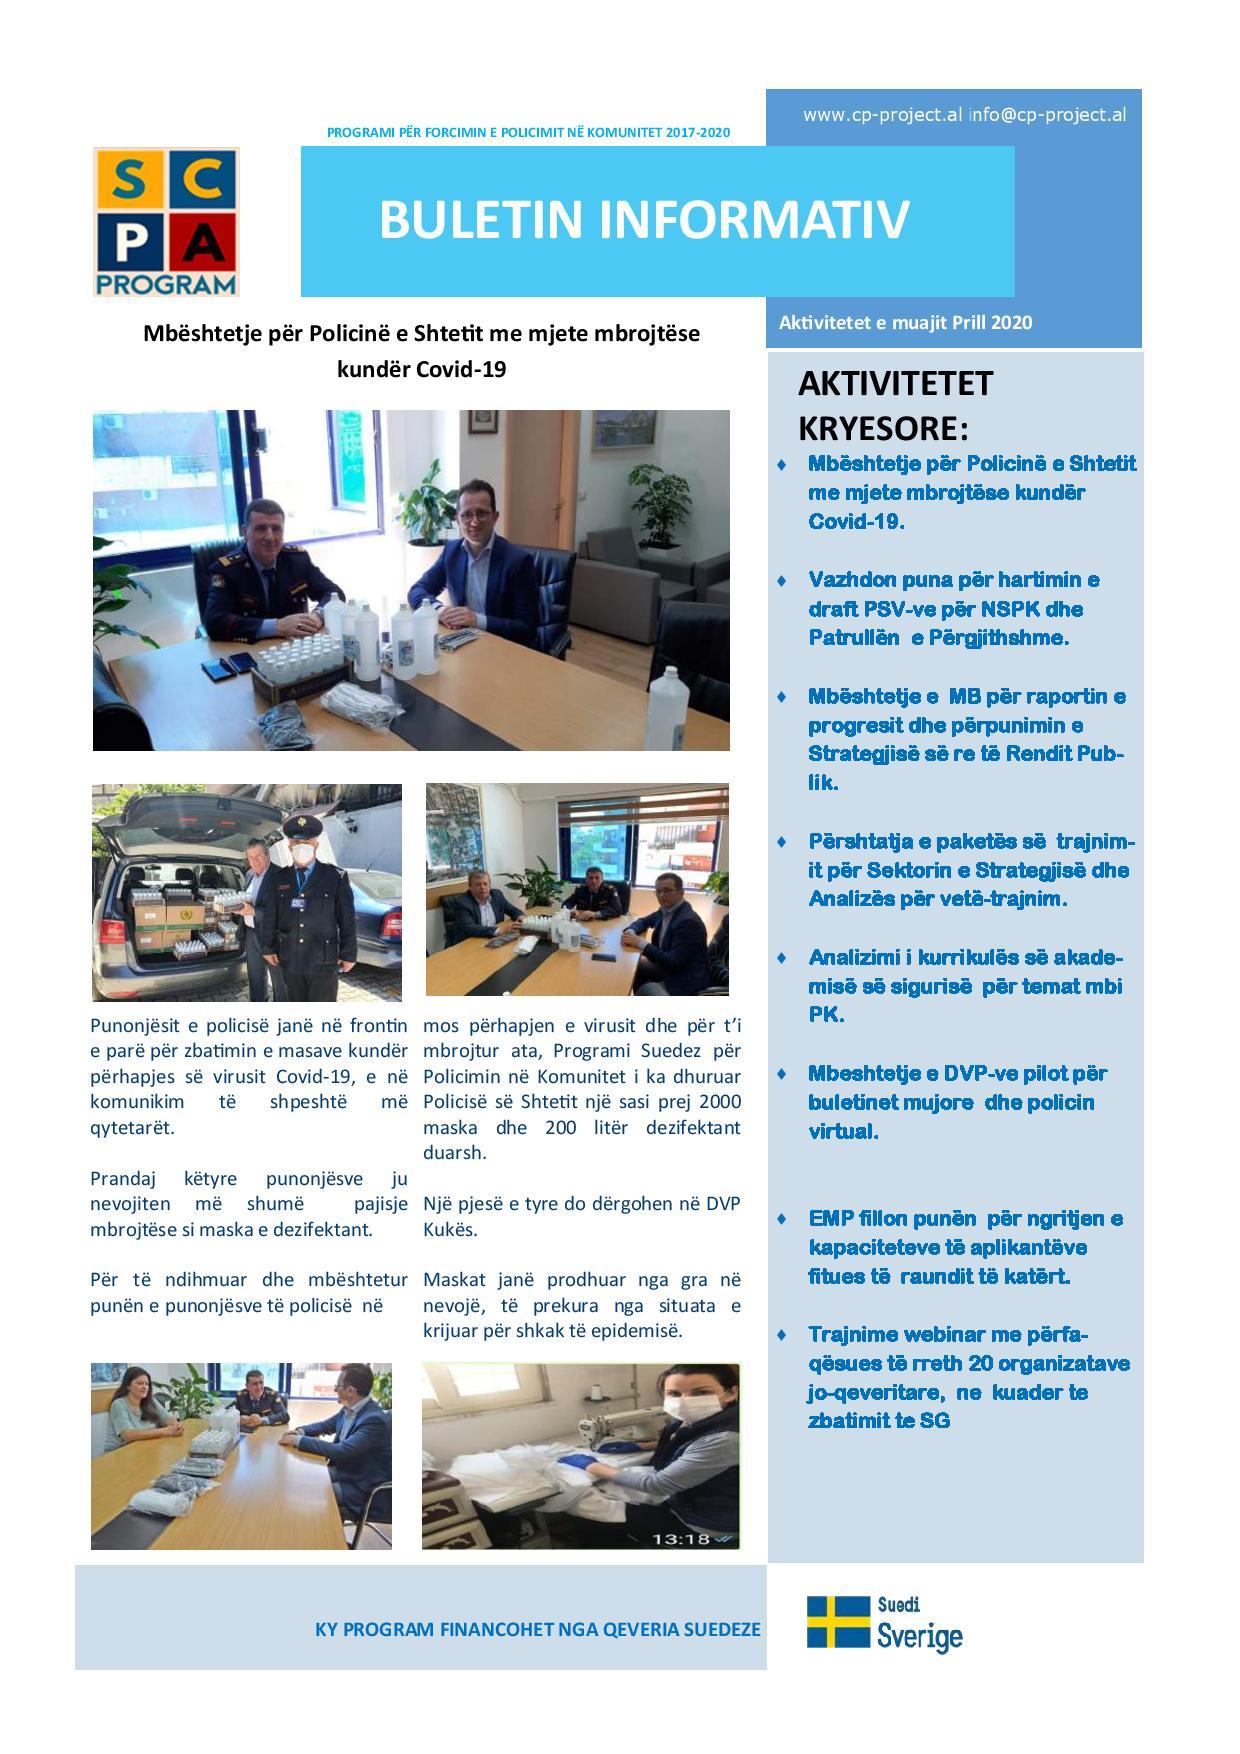 Buletini informativ Prill 2020-compressed (1)-page-001